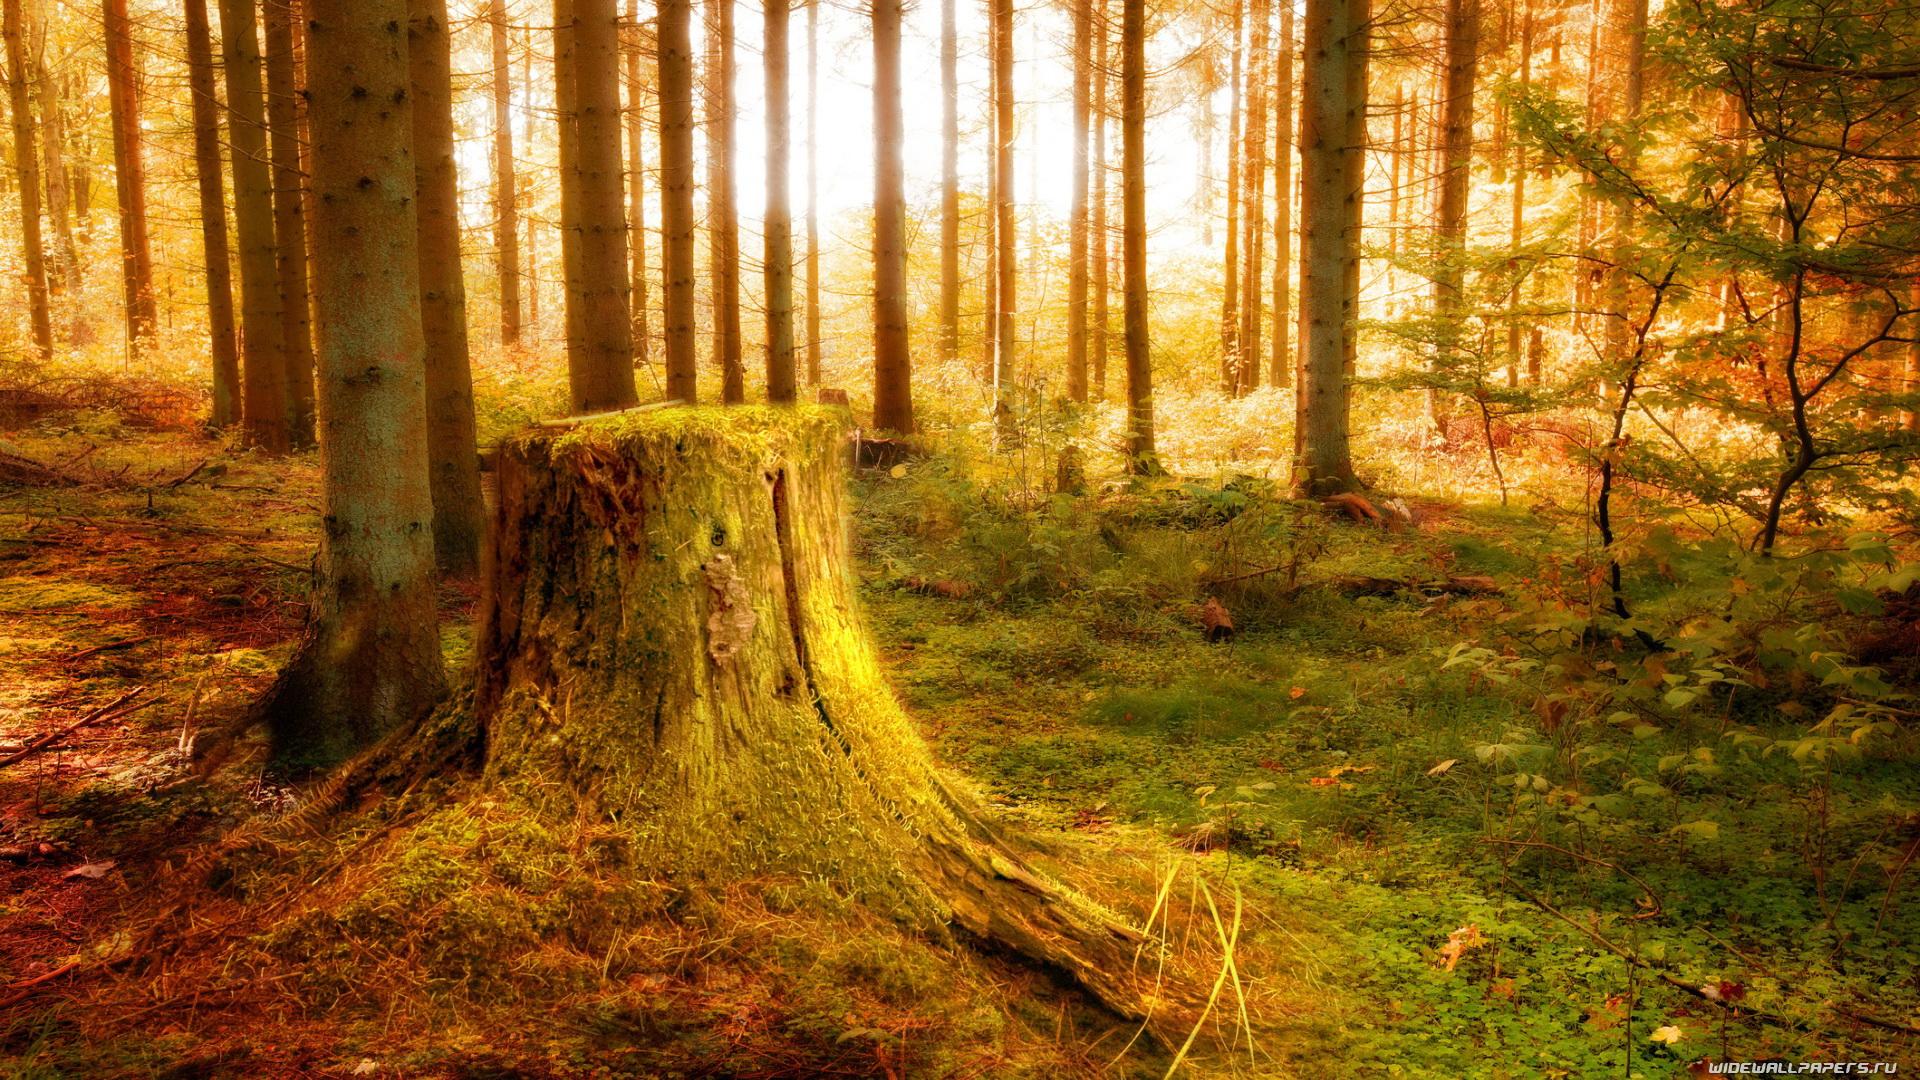 Sfondi hd natura foresta sfondi hd gratis for Sfondi hd natura